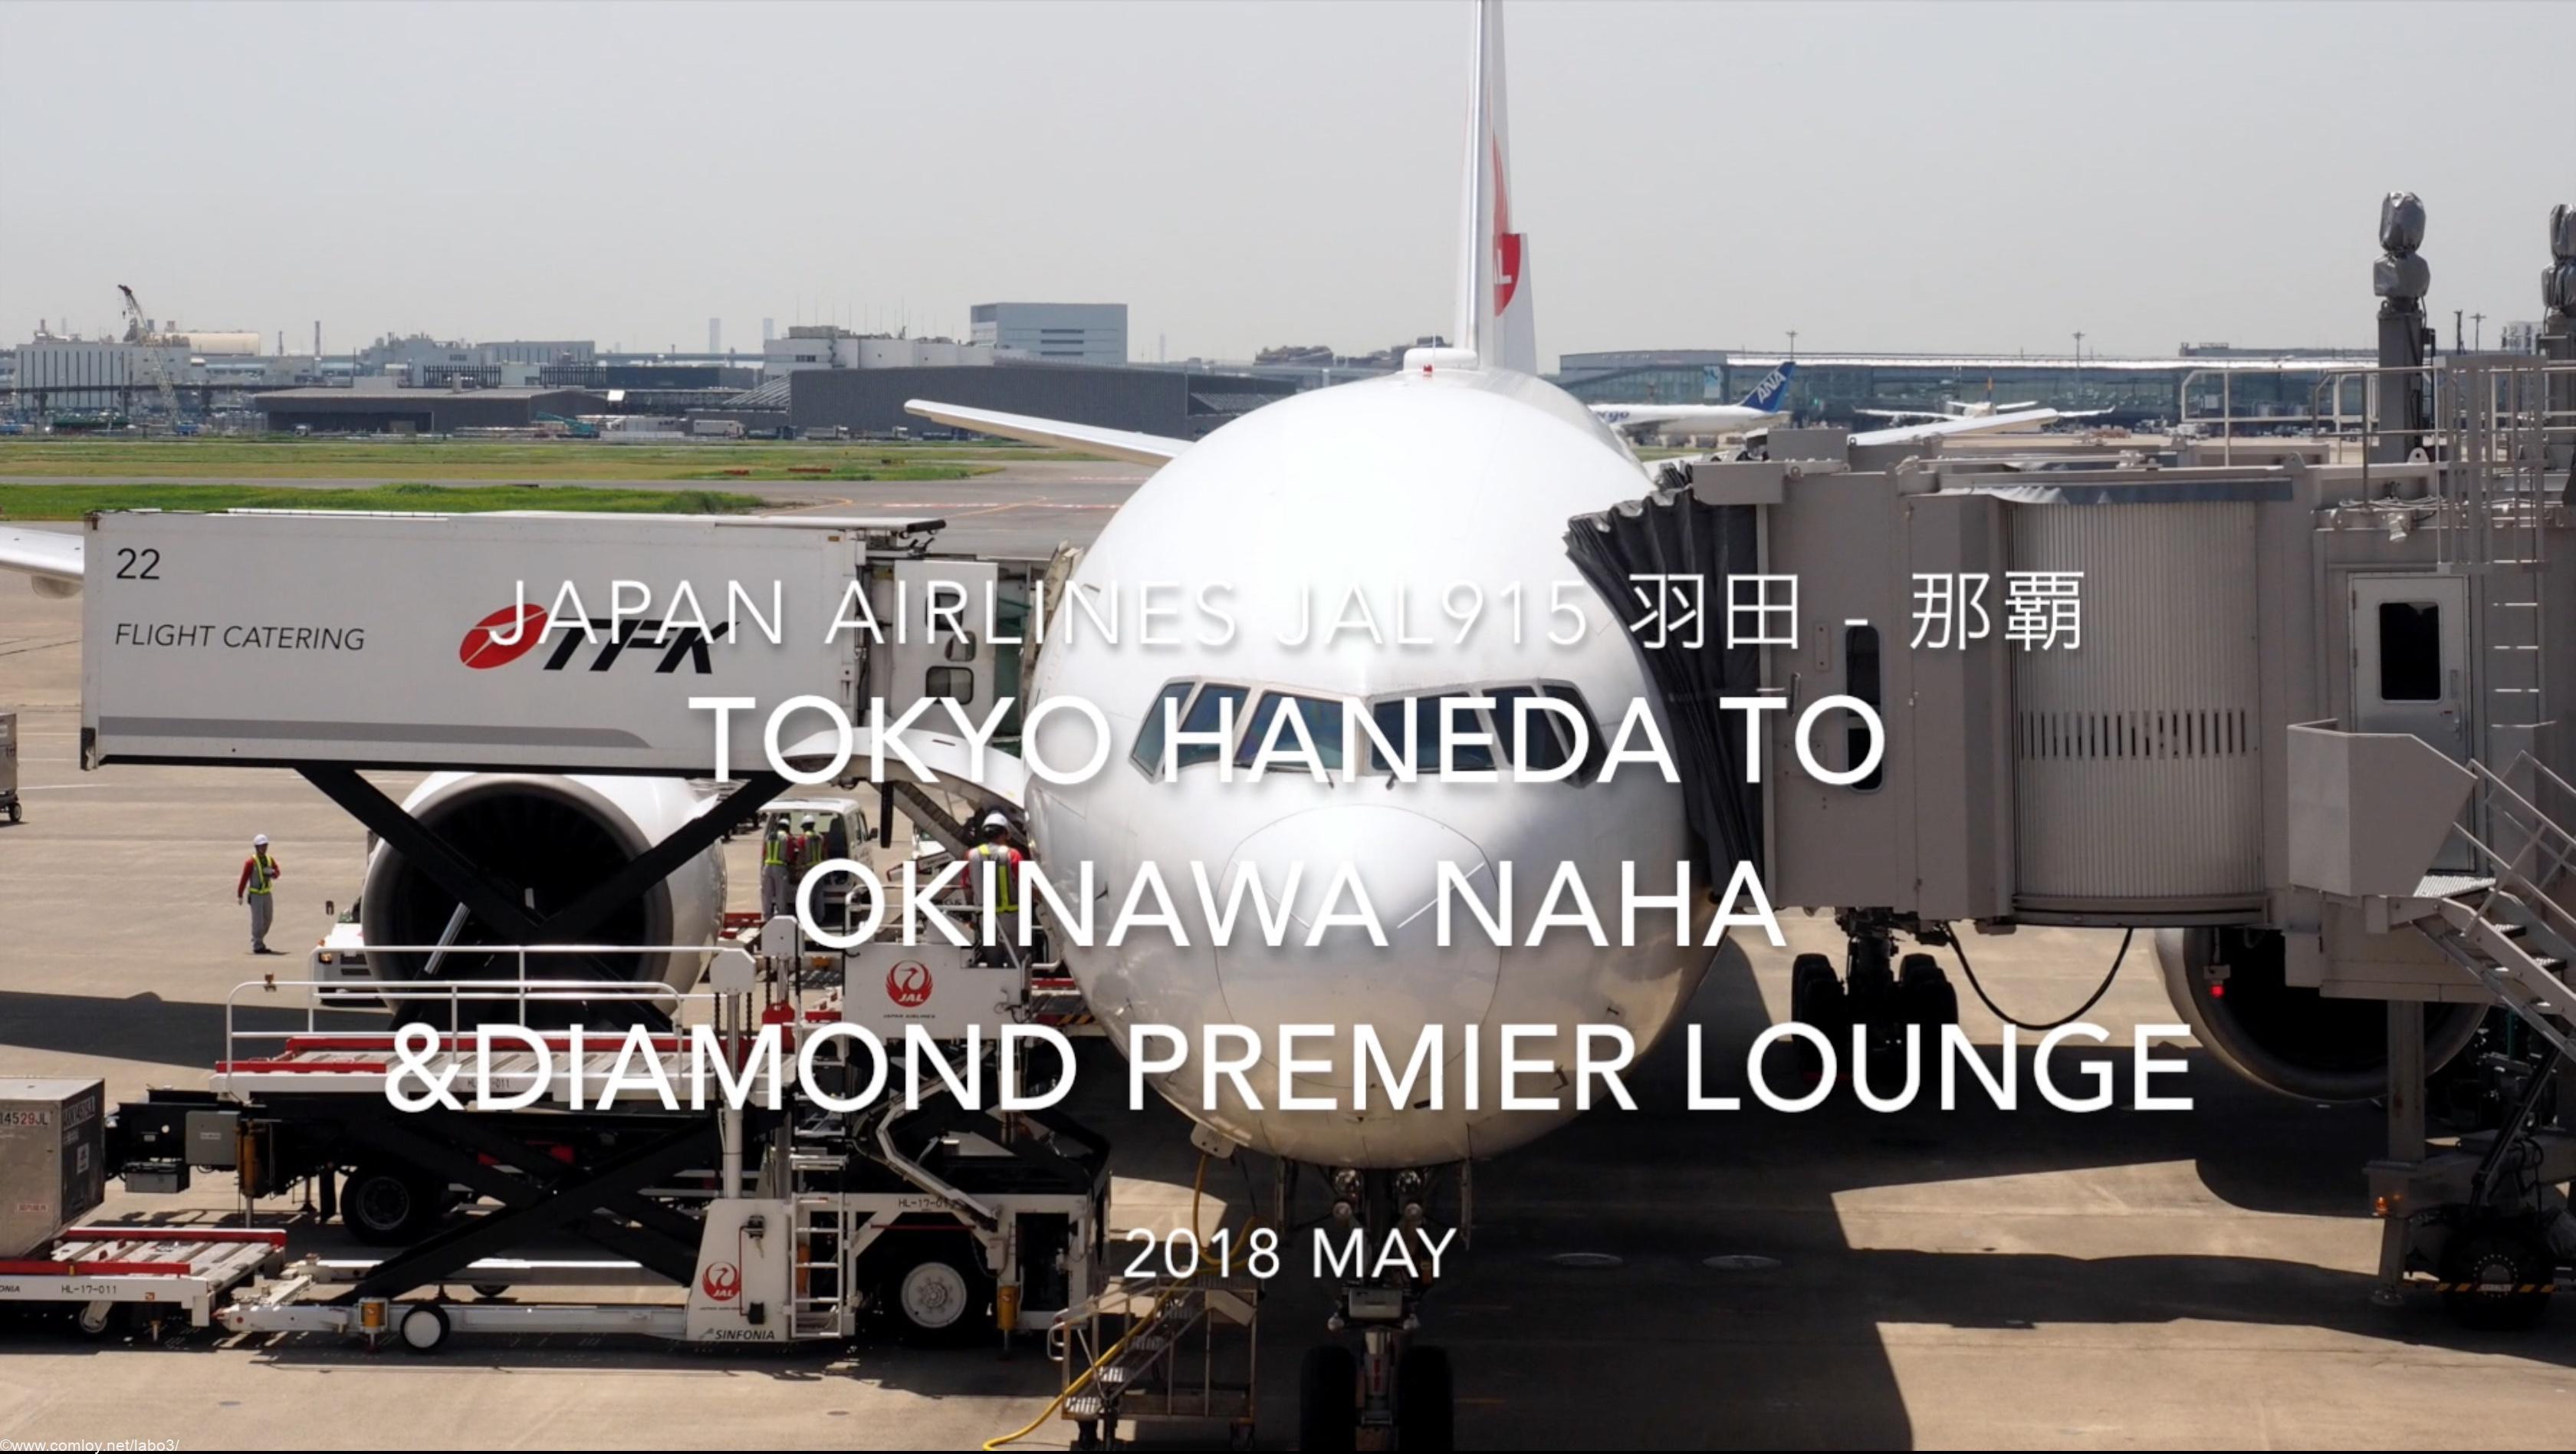 【Flight Report】 JAPAN AIRLINES JAL915 TOKYO HANEDA to OKINAWA NAHA&DIAMOND PREMIER Lounge 2017 May 日本航空 羽田 - 那覇 搭乗記